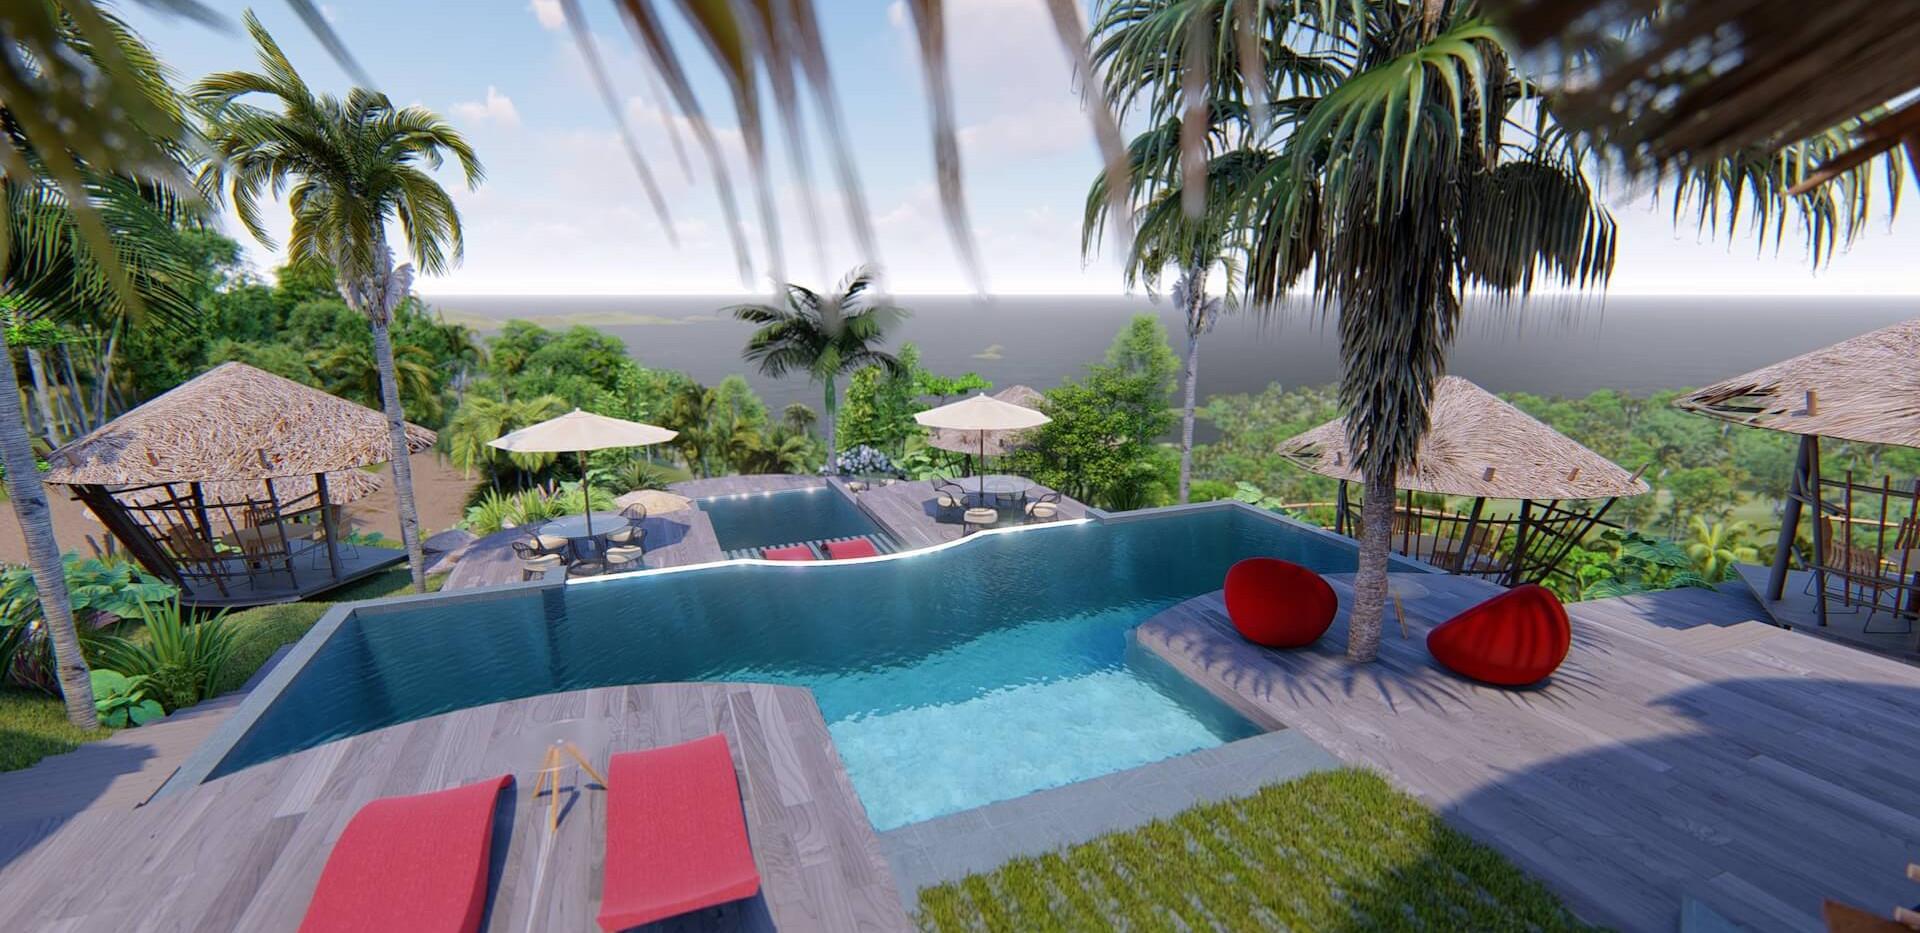 Restaurant le balcon - Swimming pool.jpg